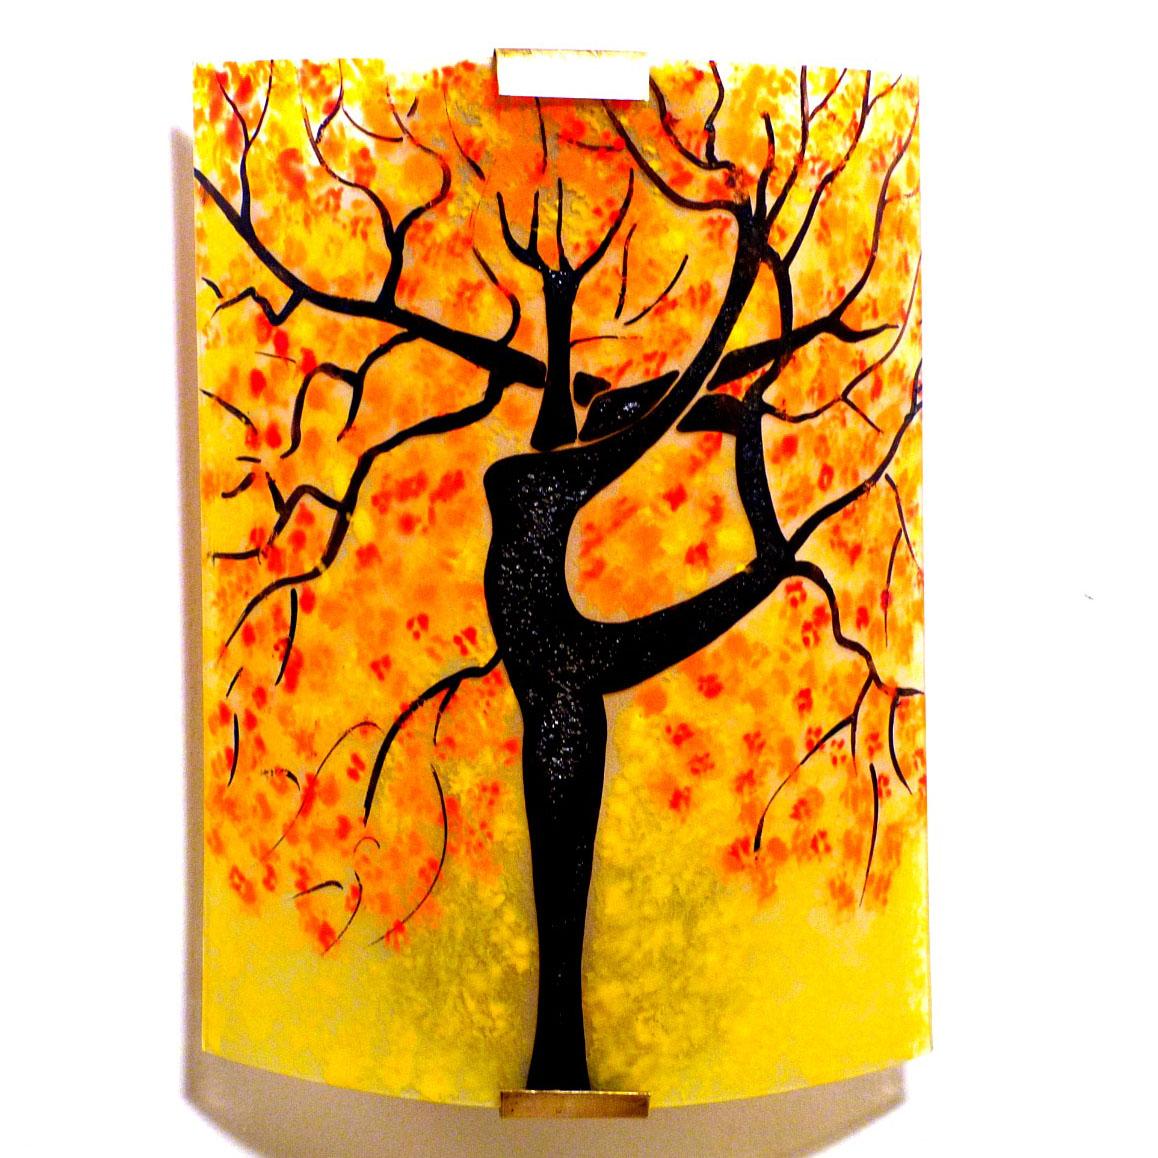 Applique murale jaune motif arbre danseuse rouge et orange 2